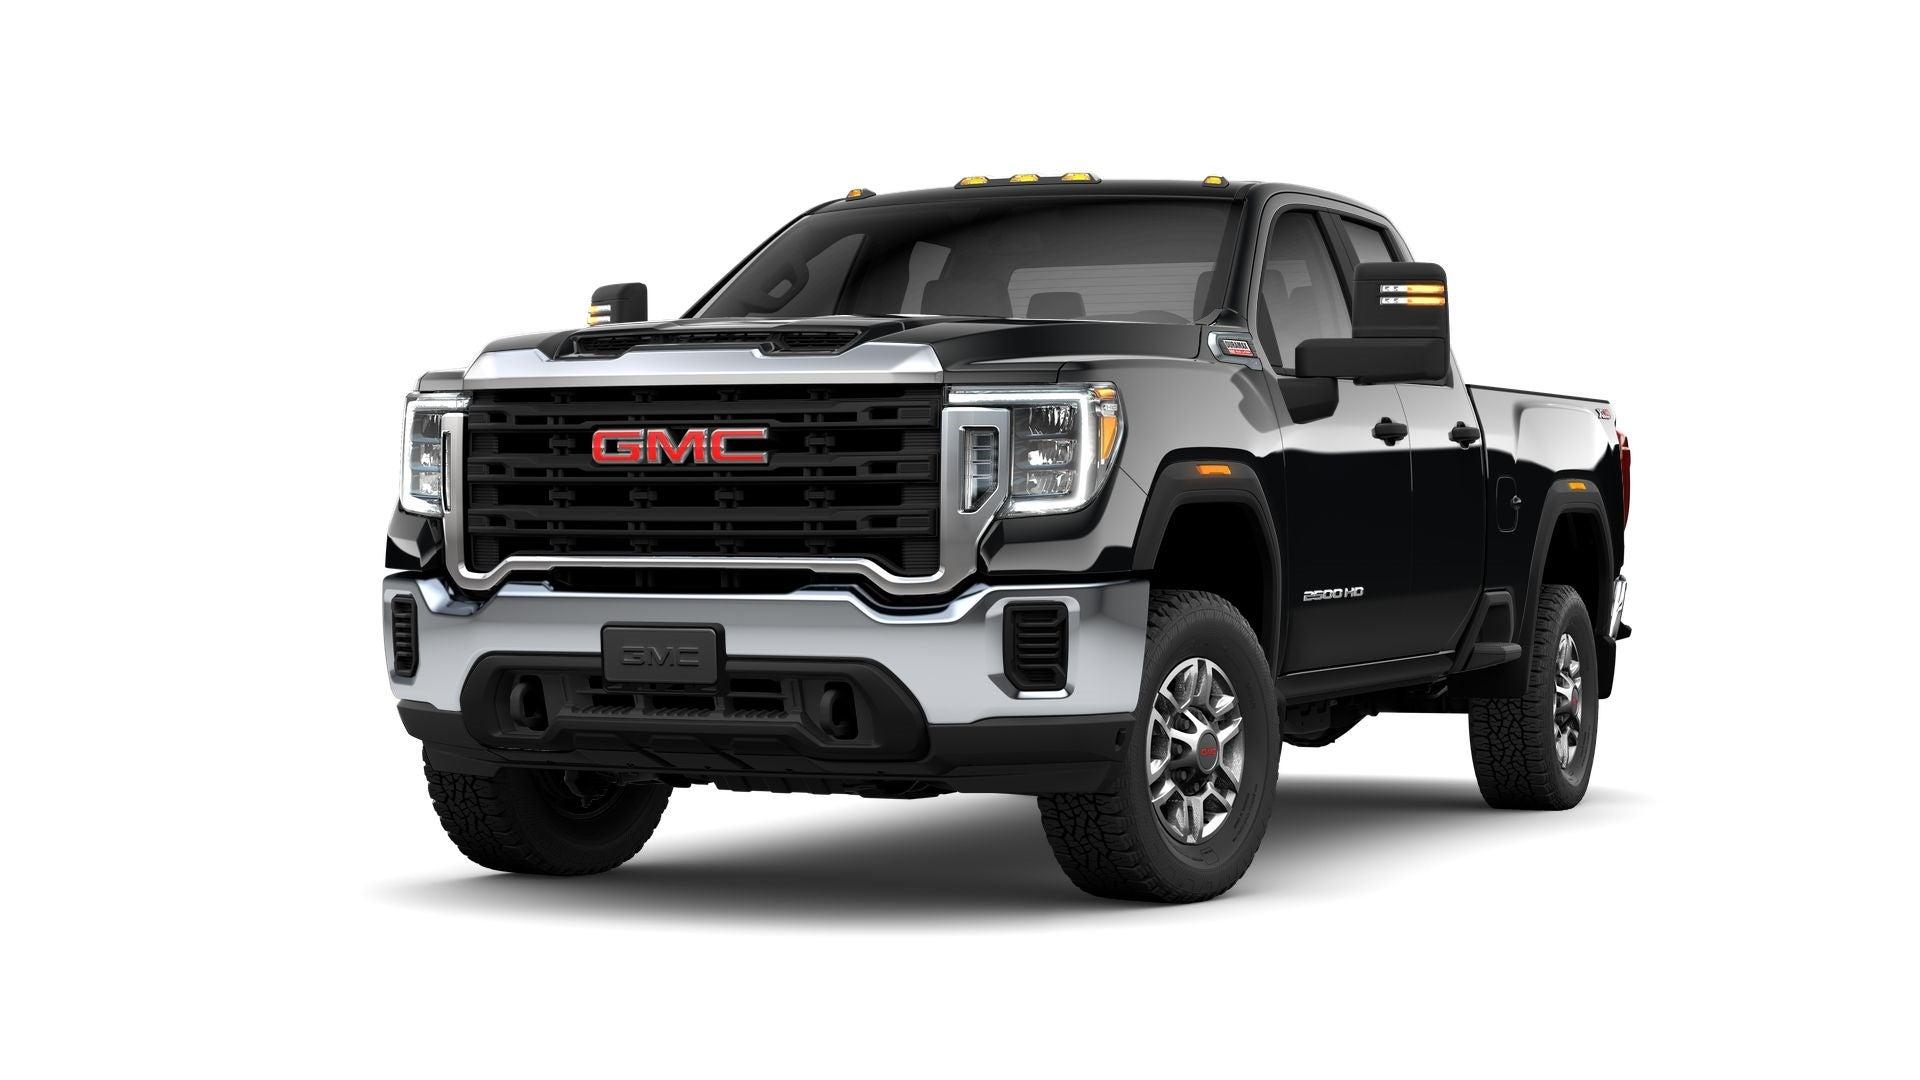 new 2016 gmc sierra 2500hd for sale madison wi sun prairie new 2016 gmc sierra 2500hd for sale madison wi sun prairie